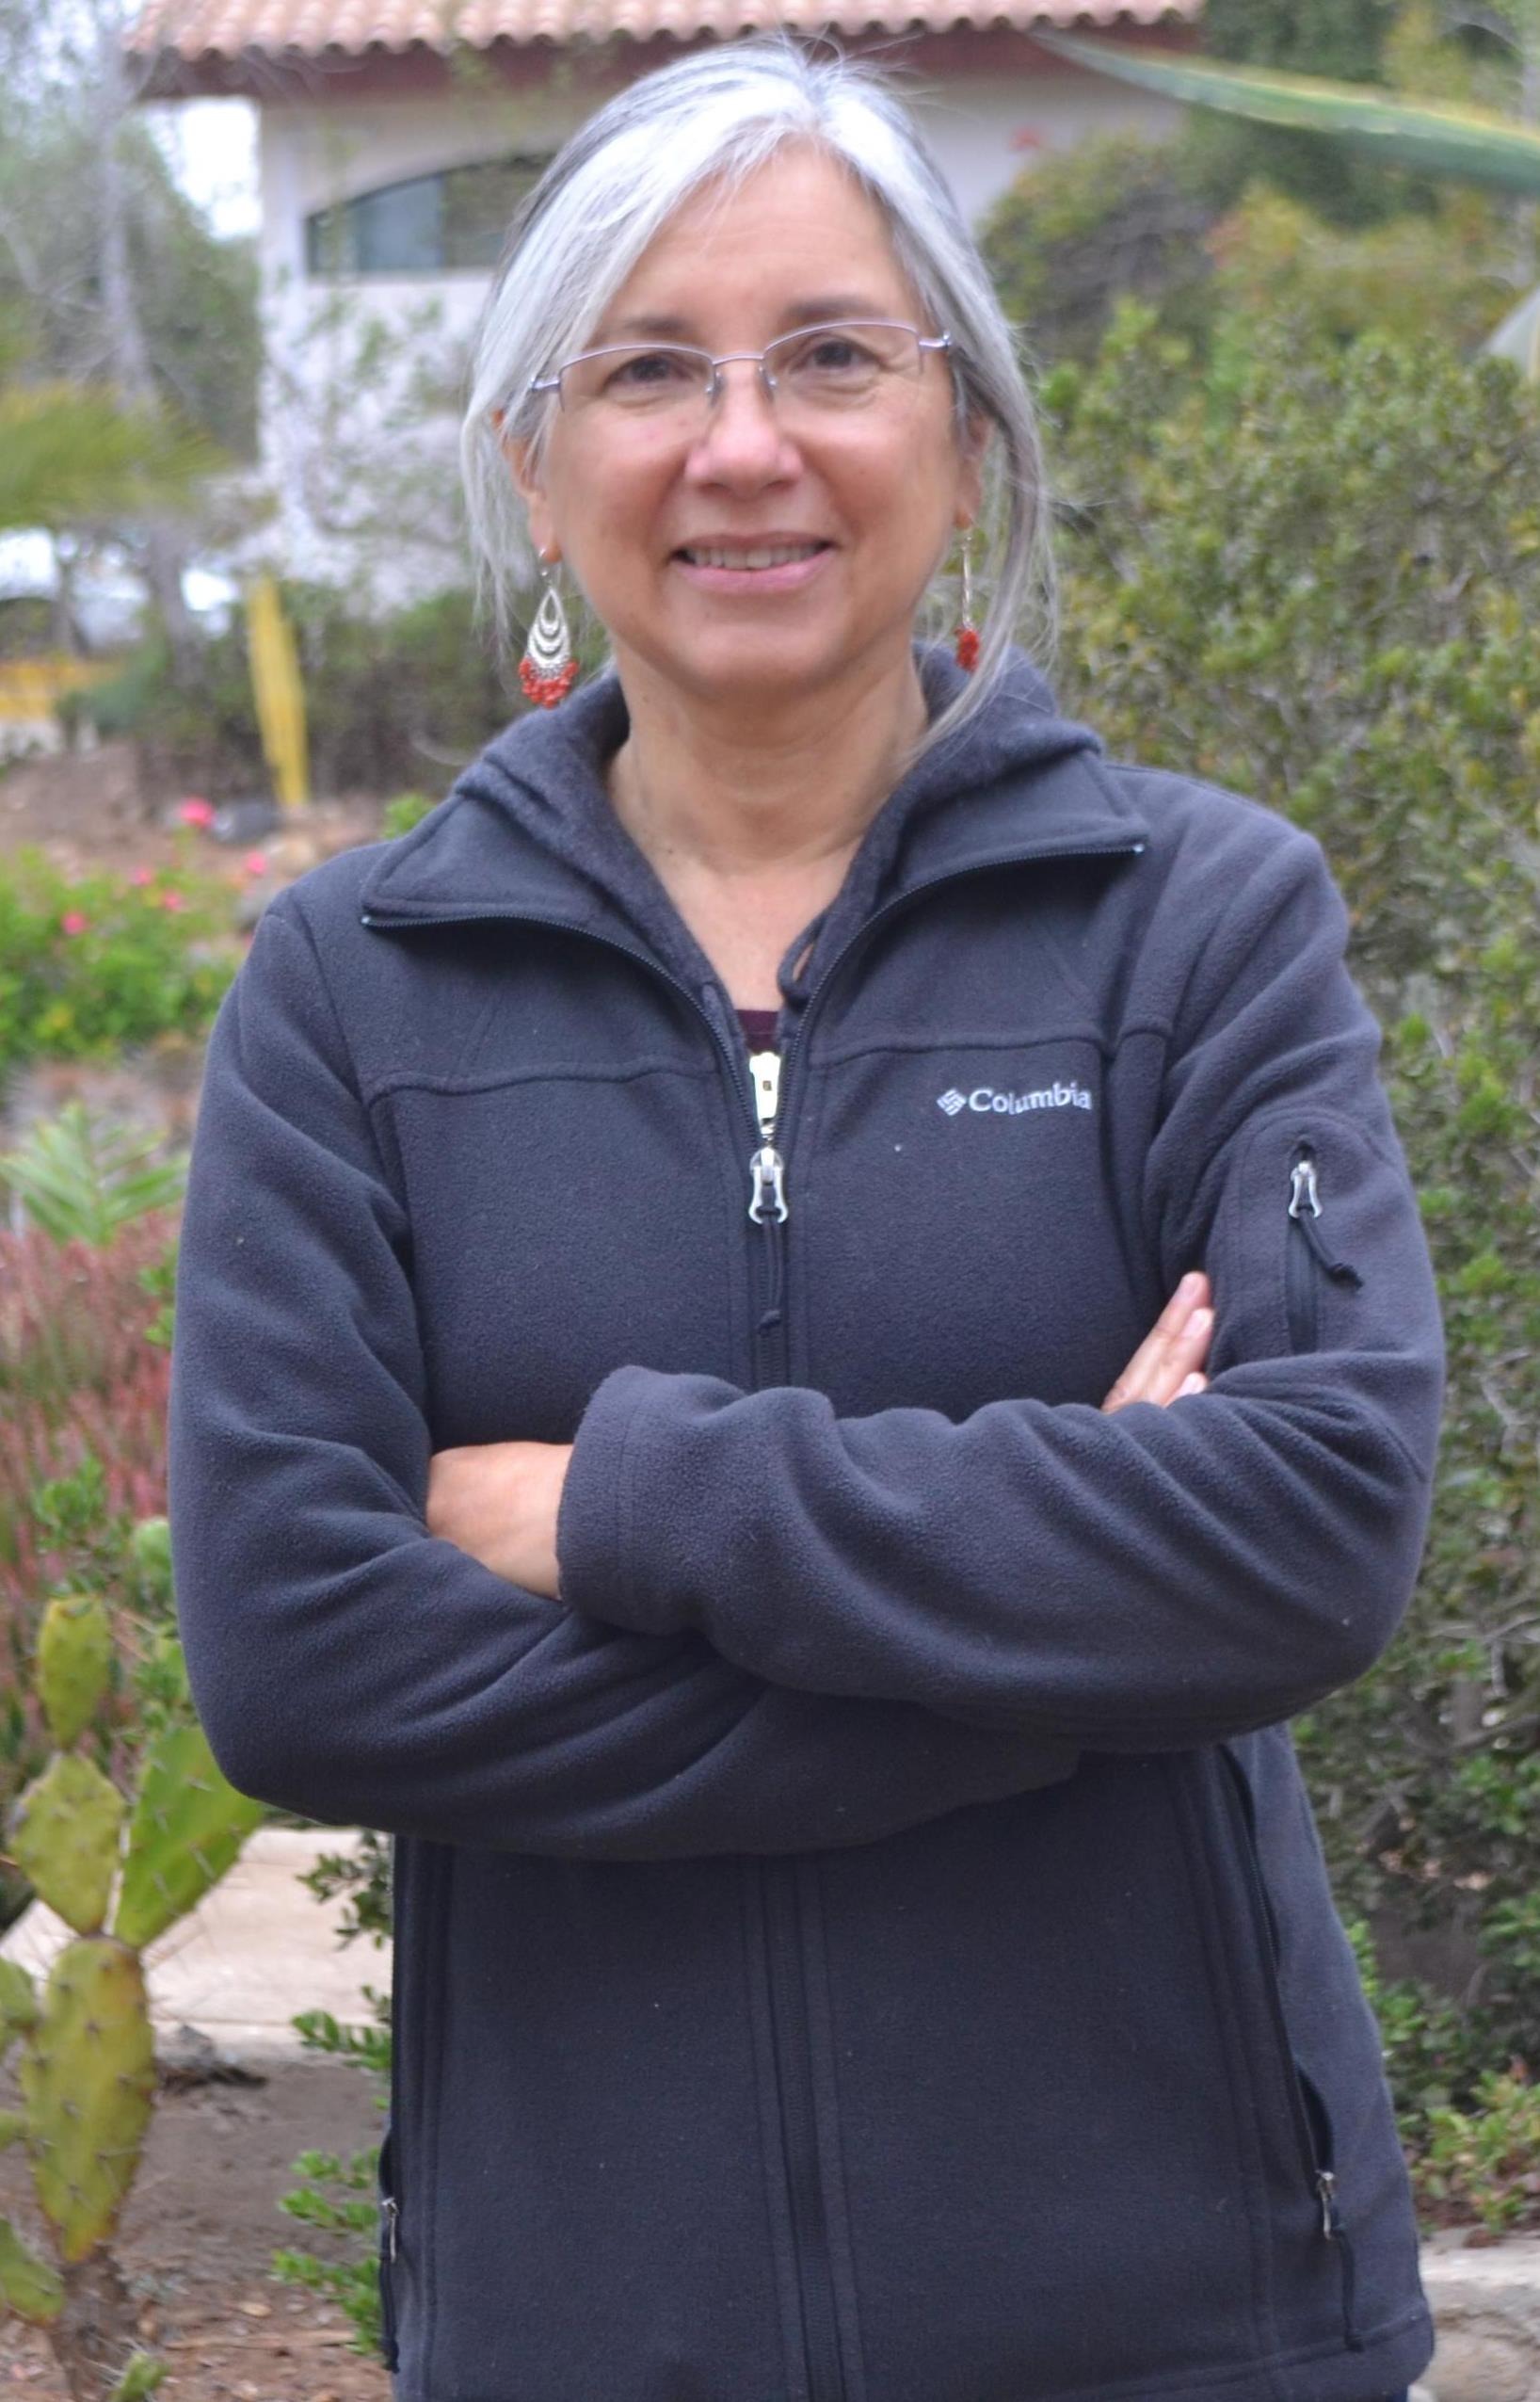 Dra. Angélica Salvatierra